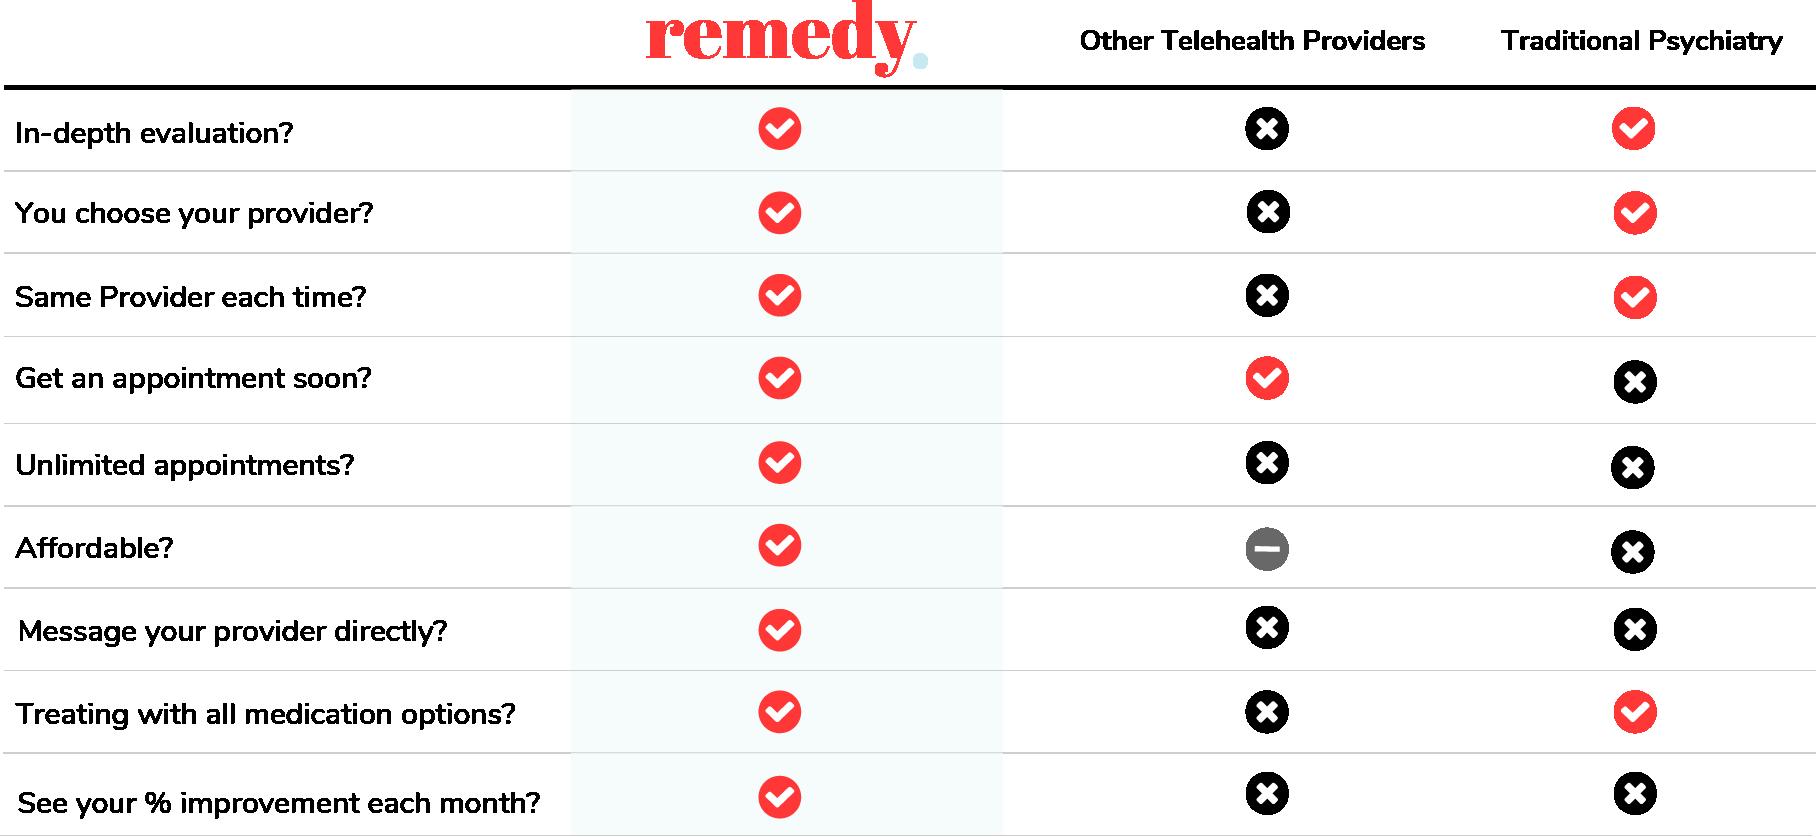 Remedy Comparison Chart vs other telehealth providers